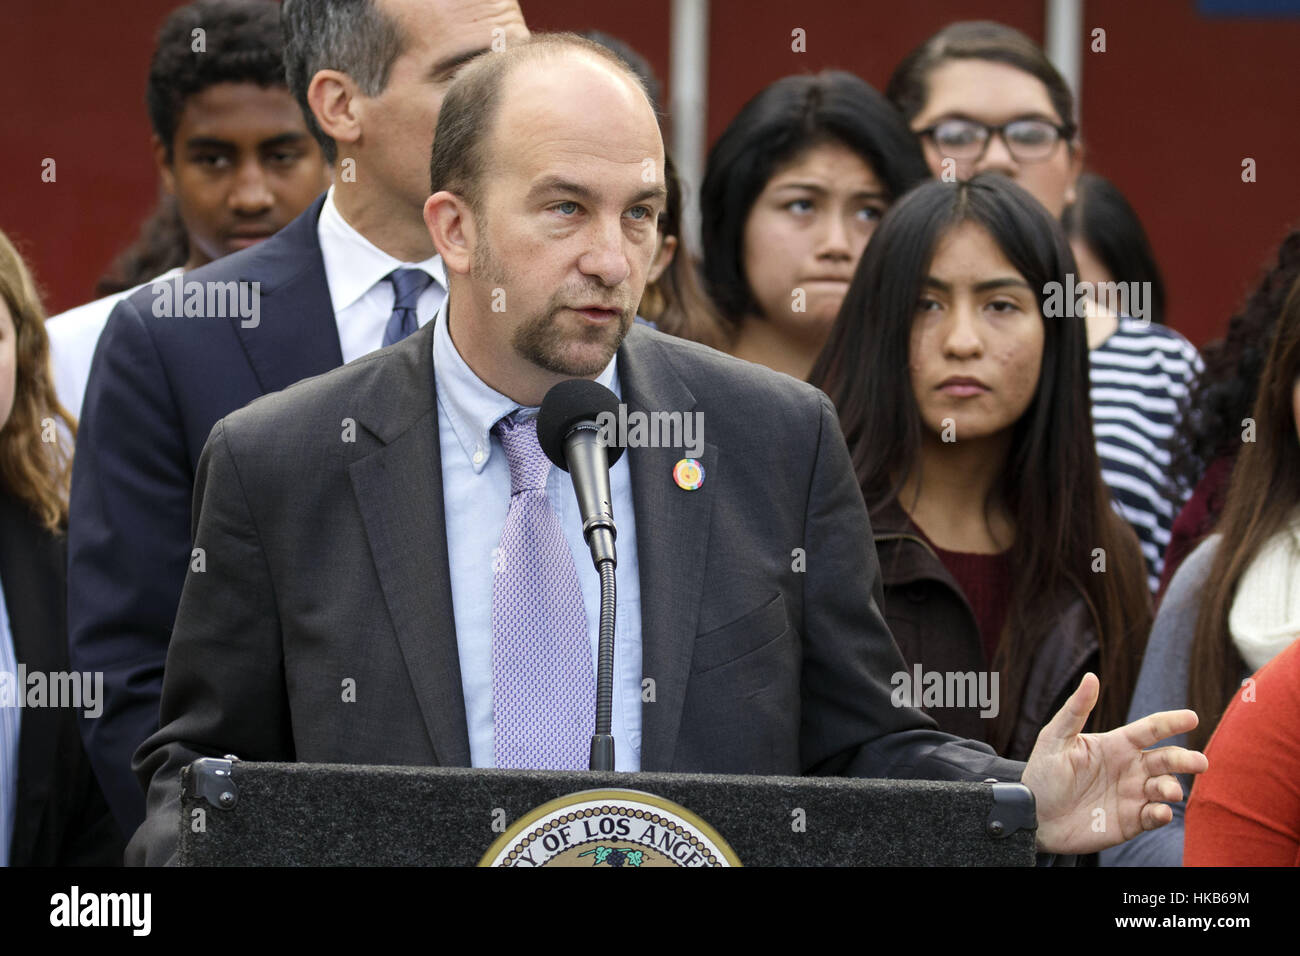 Los Angeles, CA, USA. 21st Nov, 2016. LAUSD Board President Steve Zimmer speaks alongside Los Angeles Mayor Eric - Stock Image